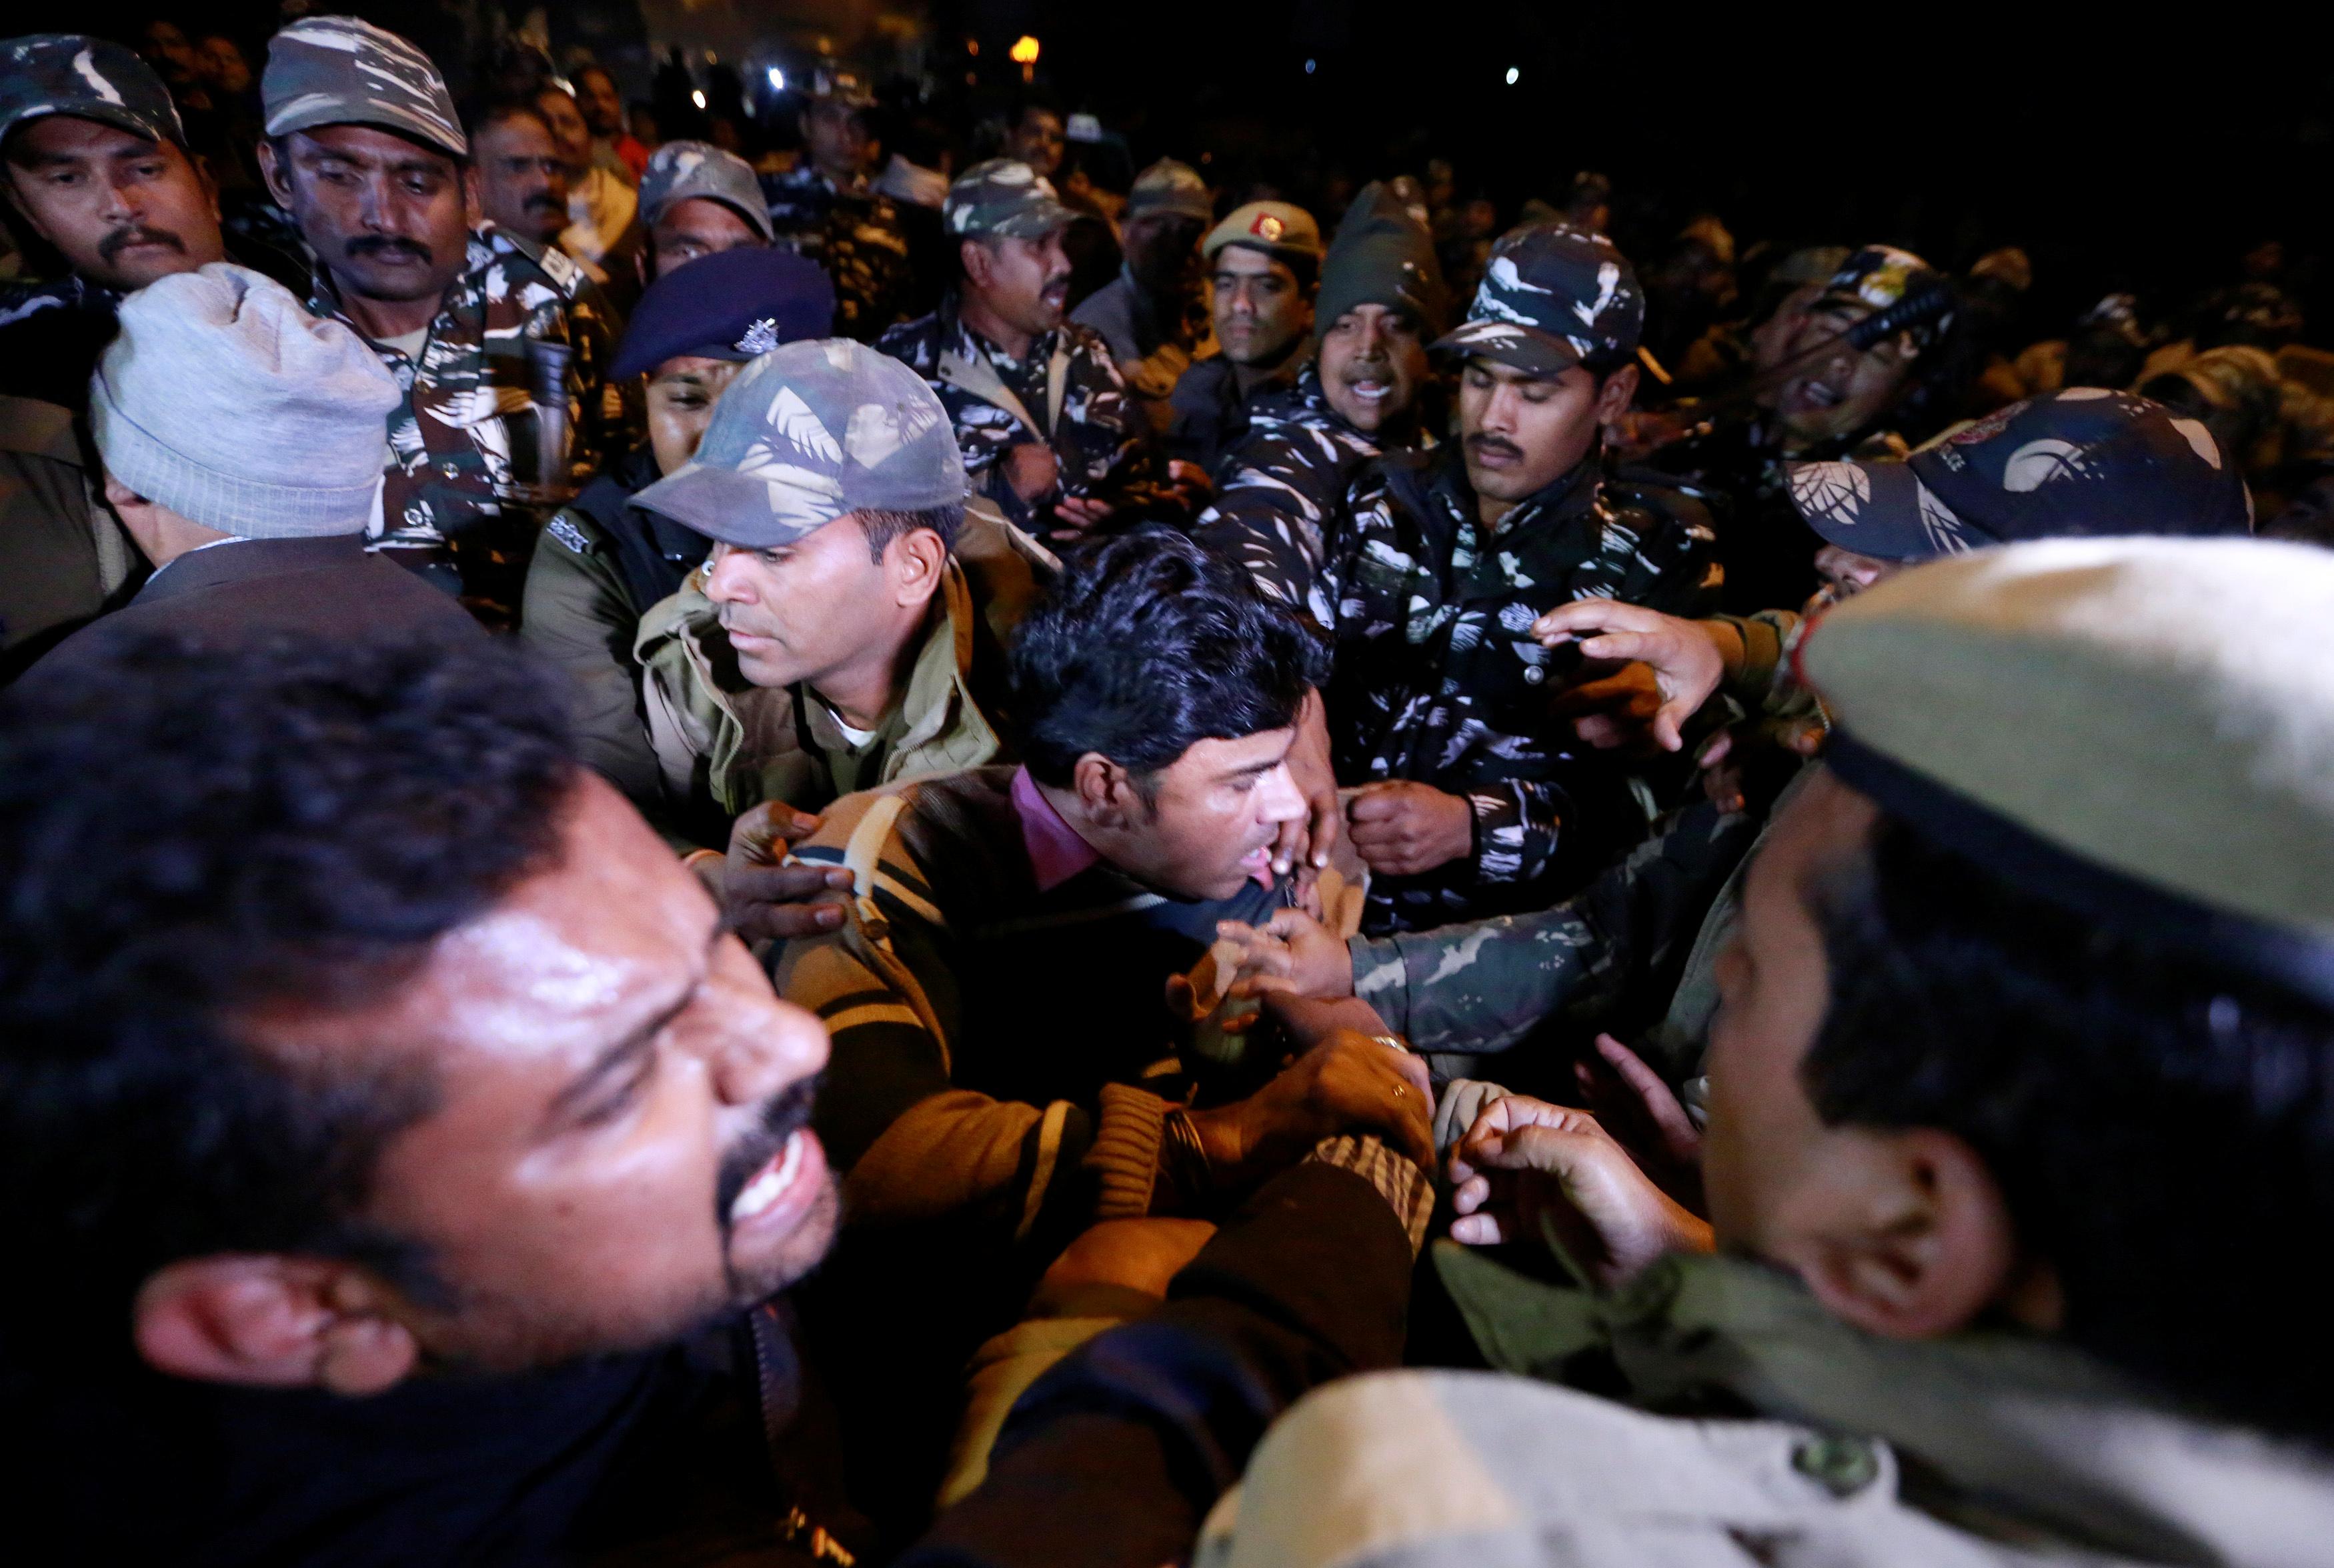 Third woman breaches ban at Indian Hindu temple amid protests | The